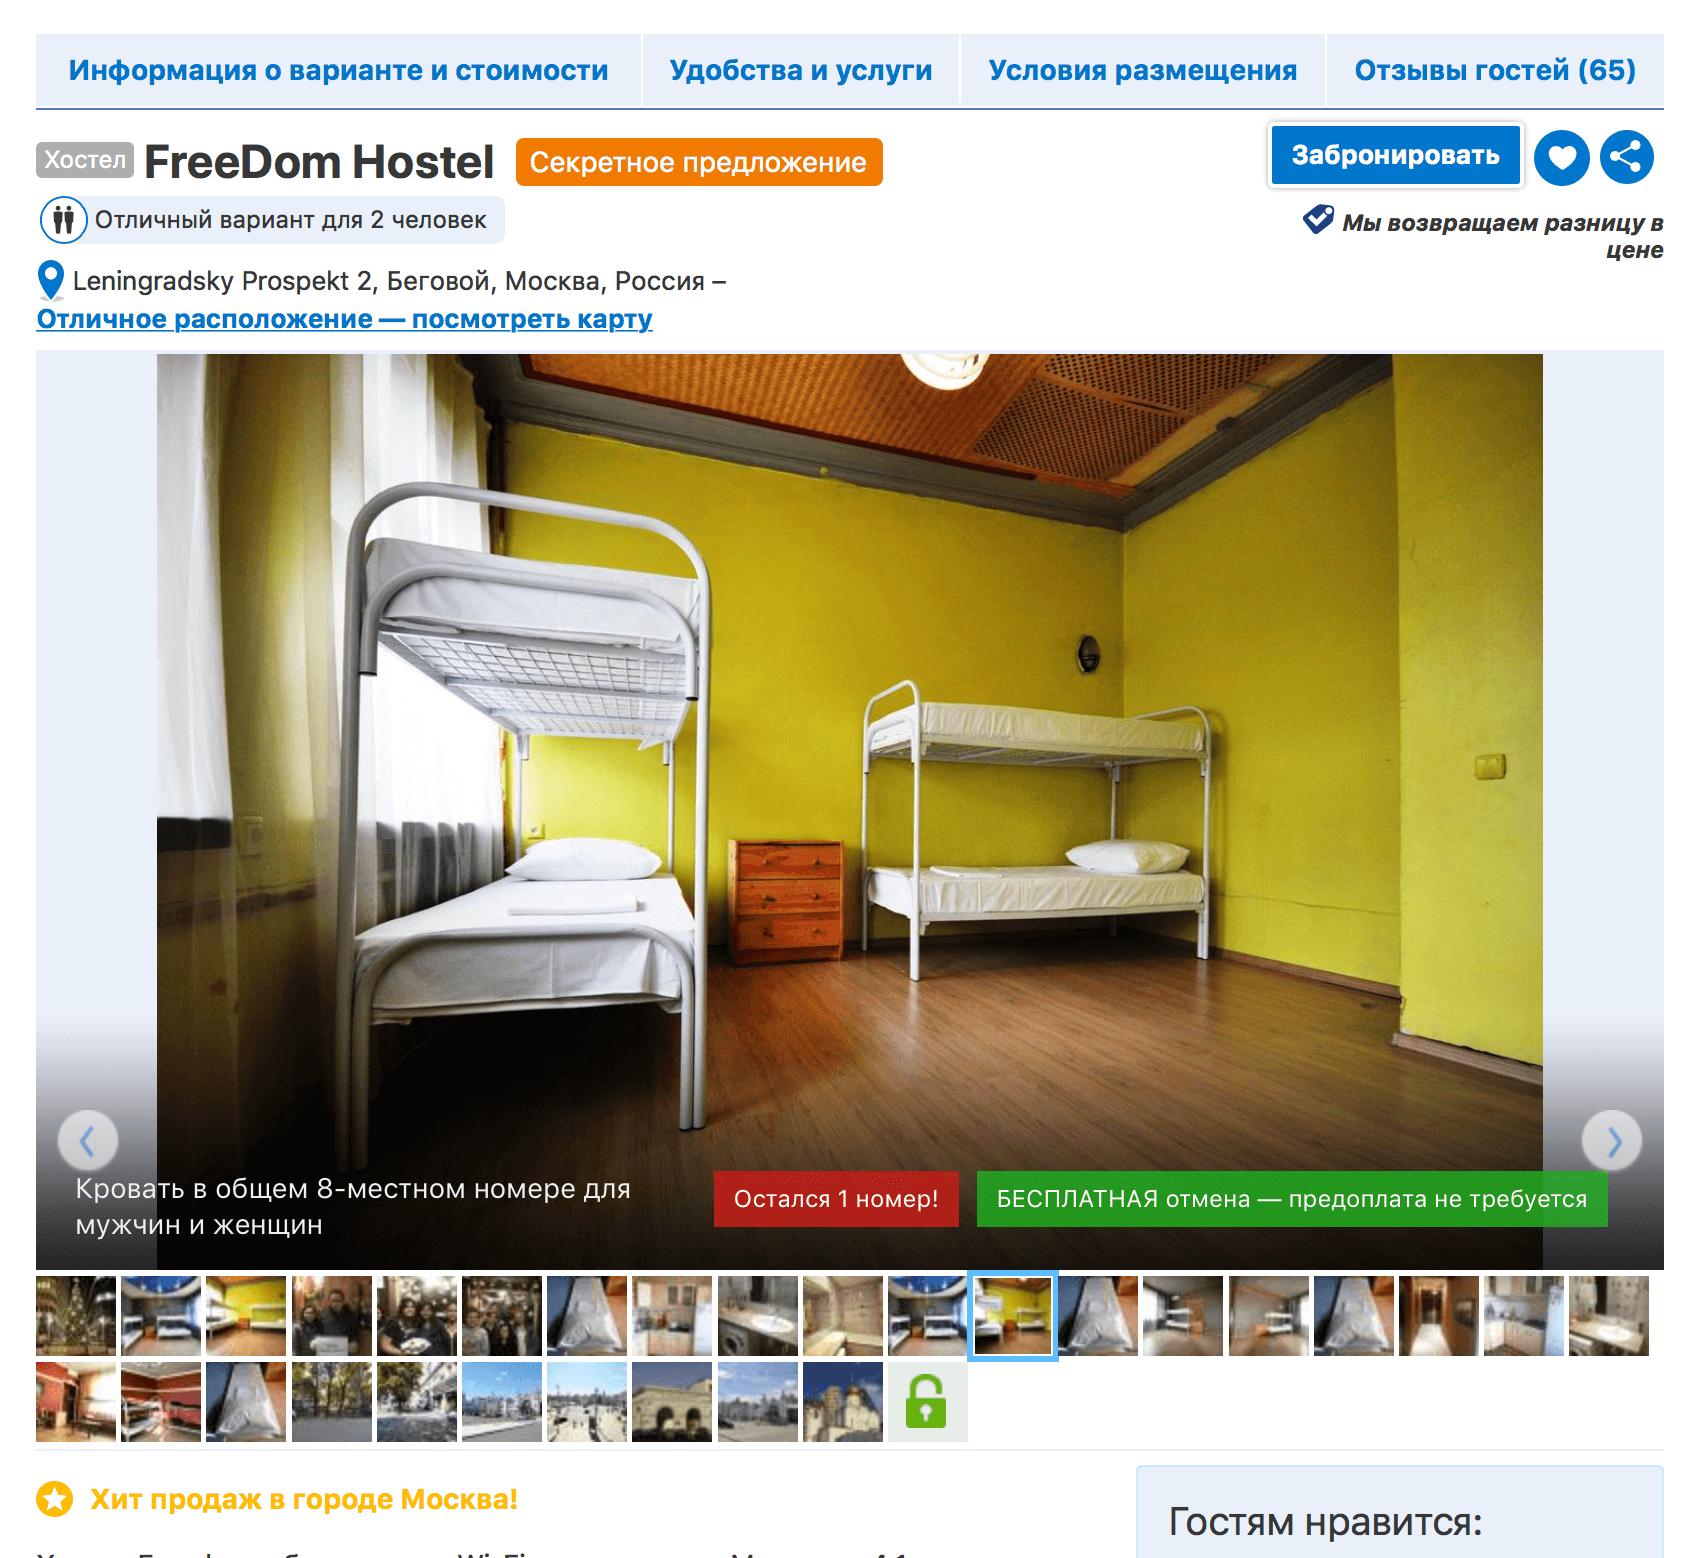 freedom-hostel